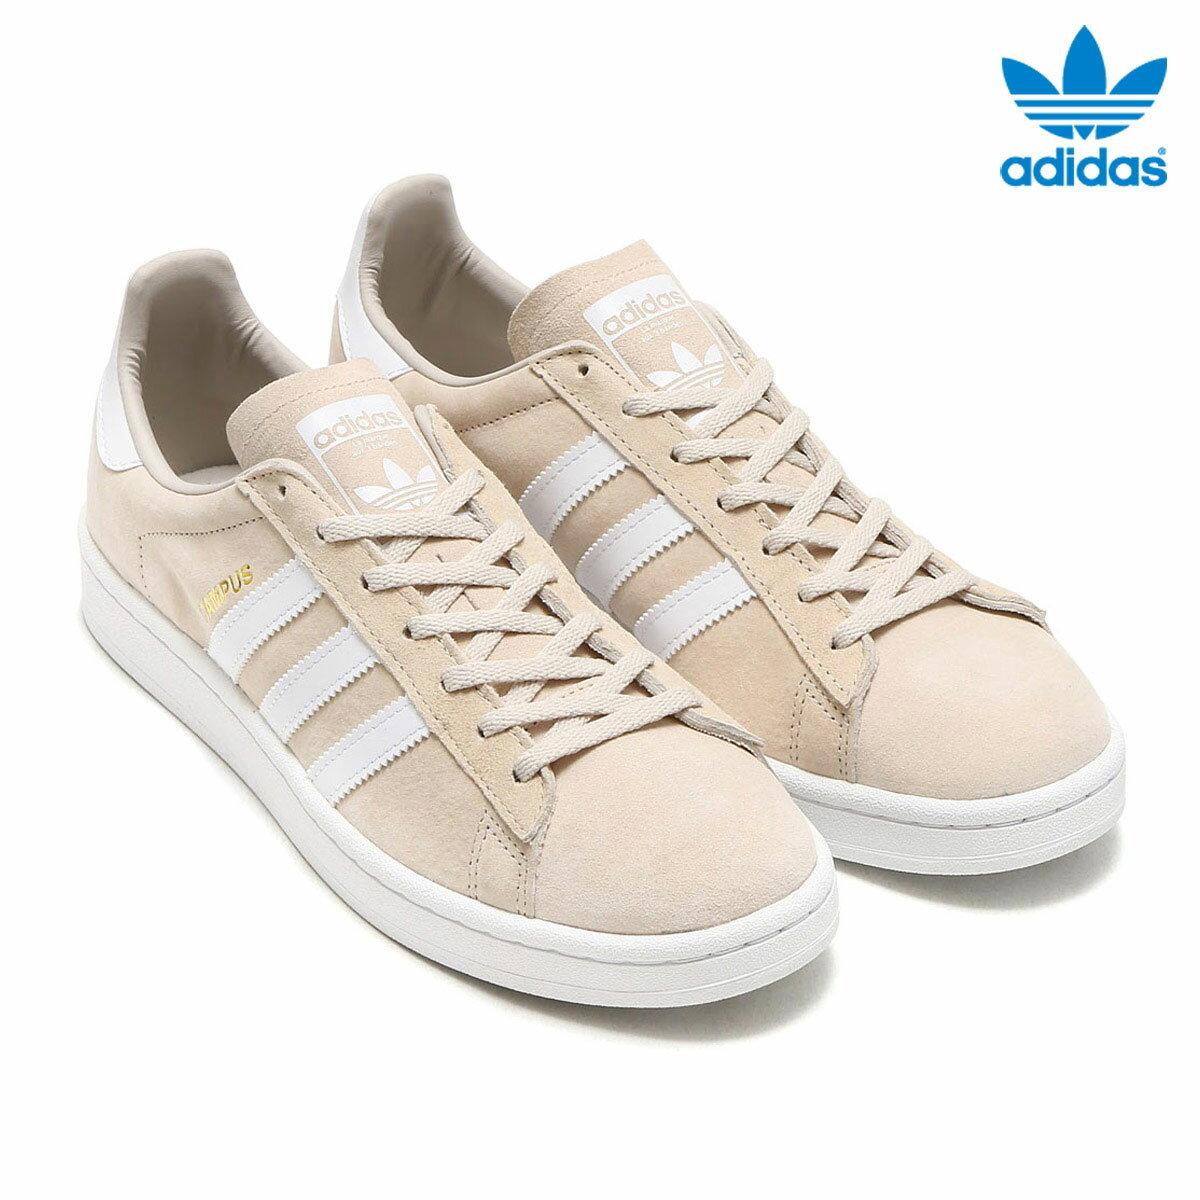 adidas Originals CAMPUS W(アディダス オリジナルス キャンパス W)(Clear Brown/Running White/Crystal White) 【メンズ レディース スニーカー】17FW-I